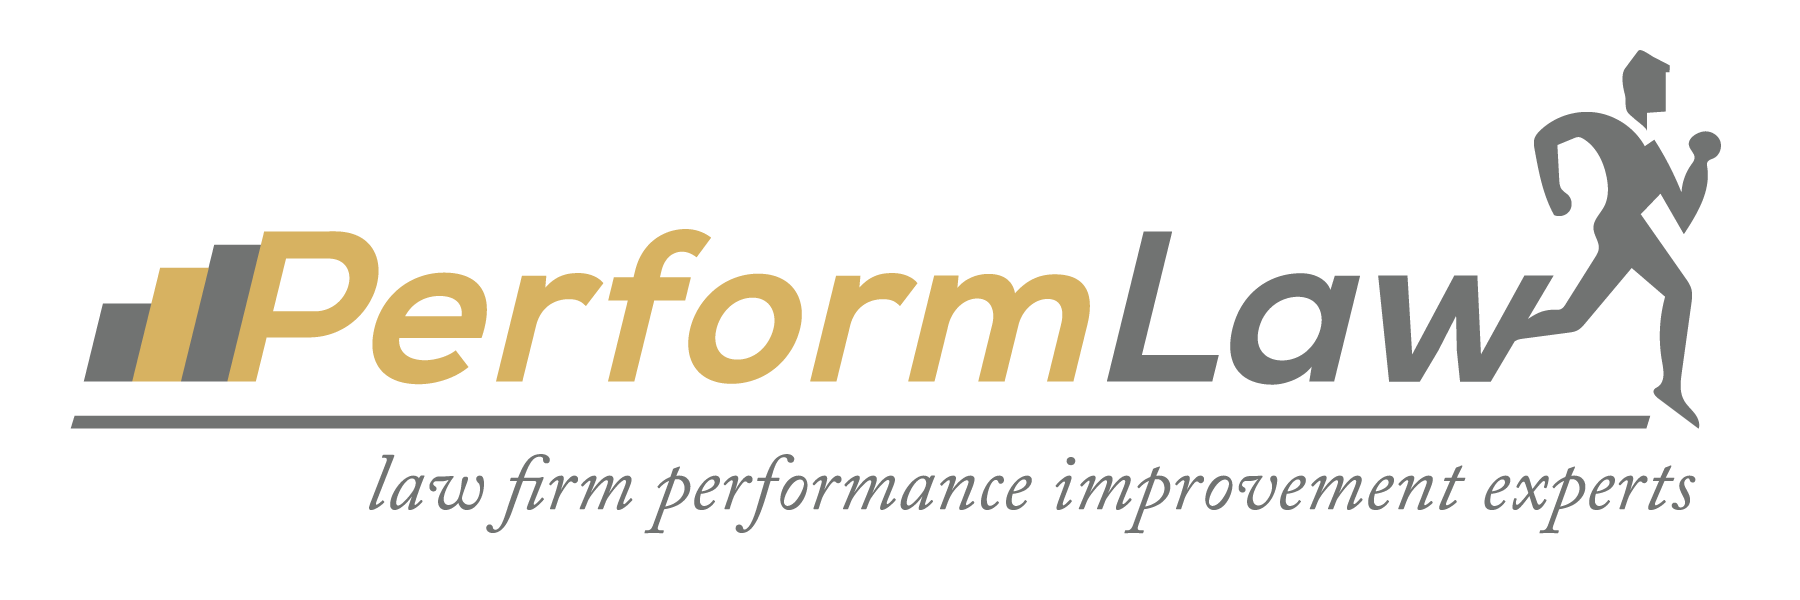 PerformLaw